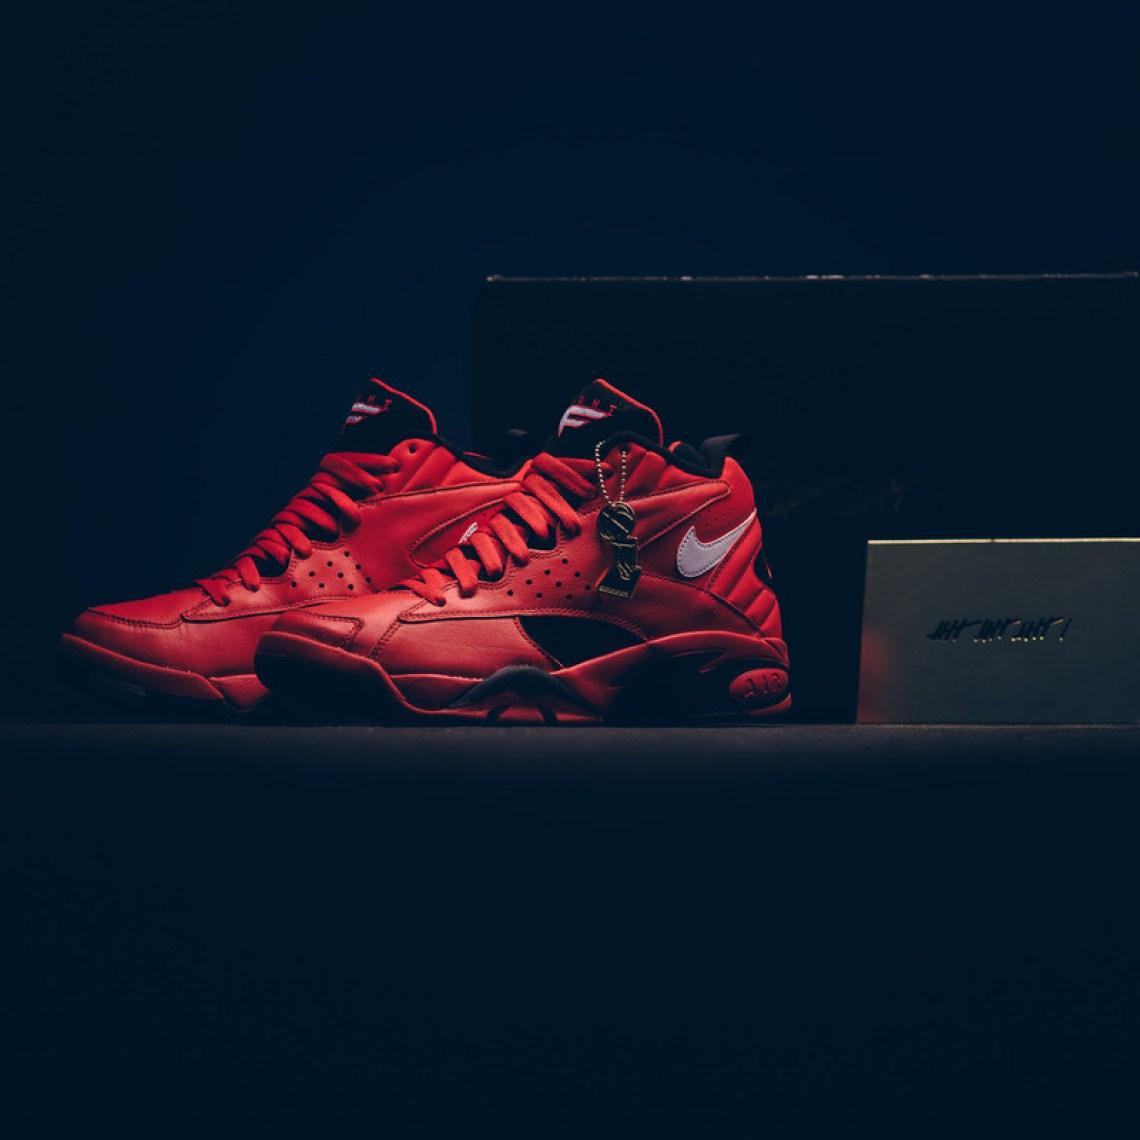 3dcb72bddbea38 Nike Air Maestro II